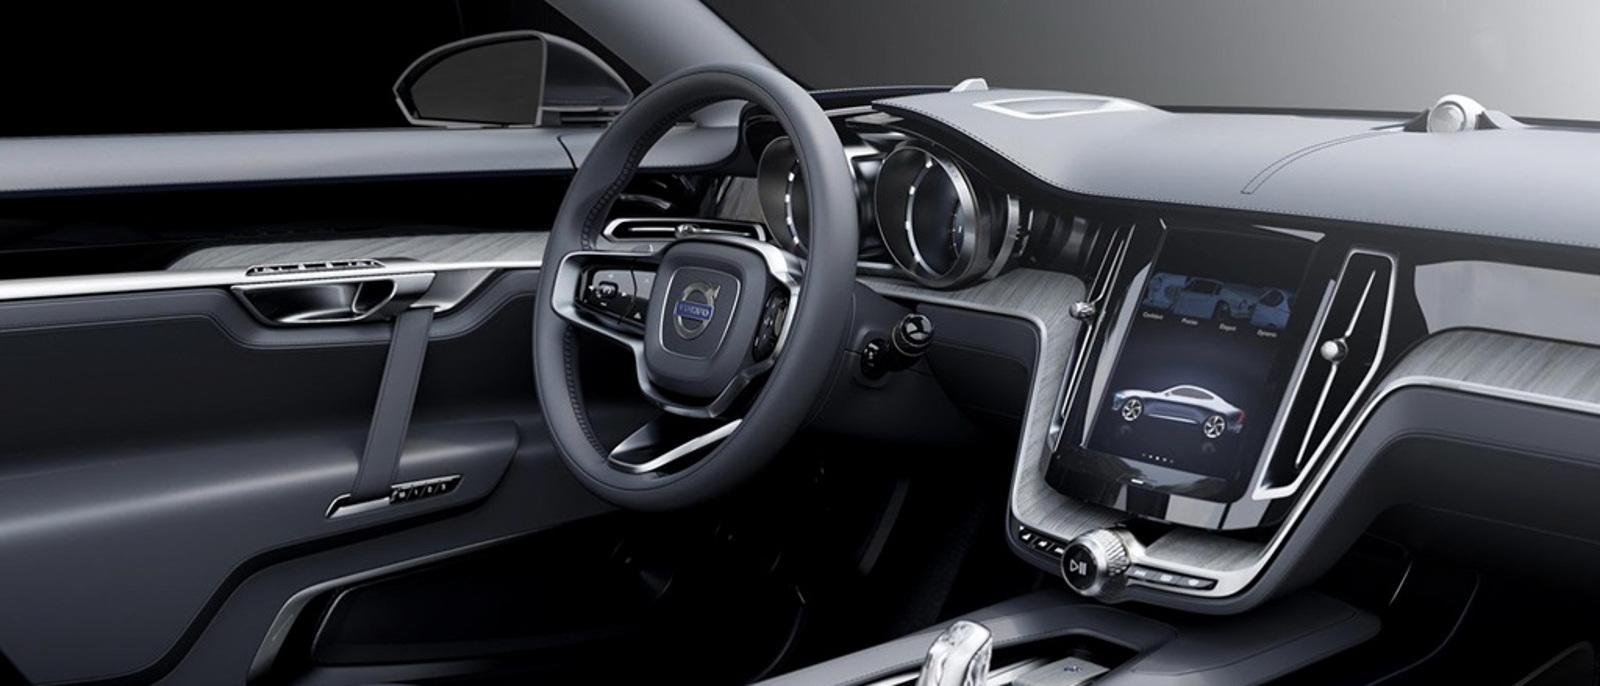 Volvo volvo coupe 2015 : Volvo Concept Coupe Model | Underriner Volvo Billings, MT